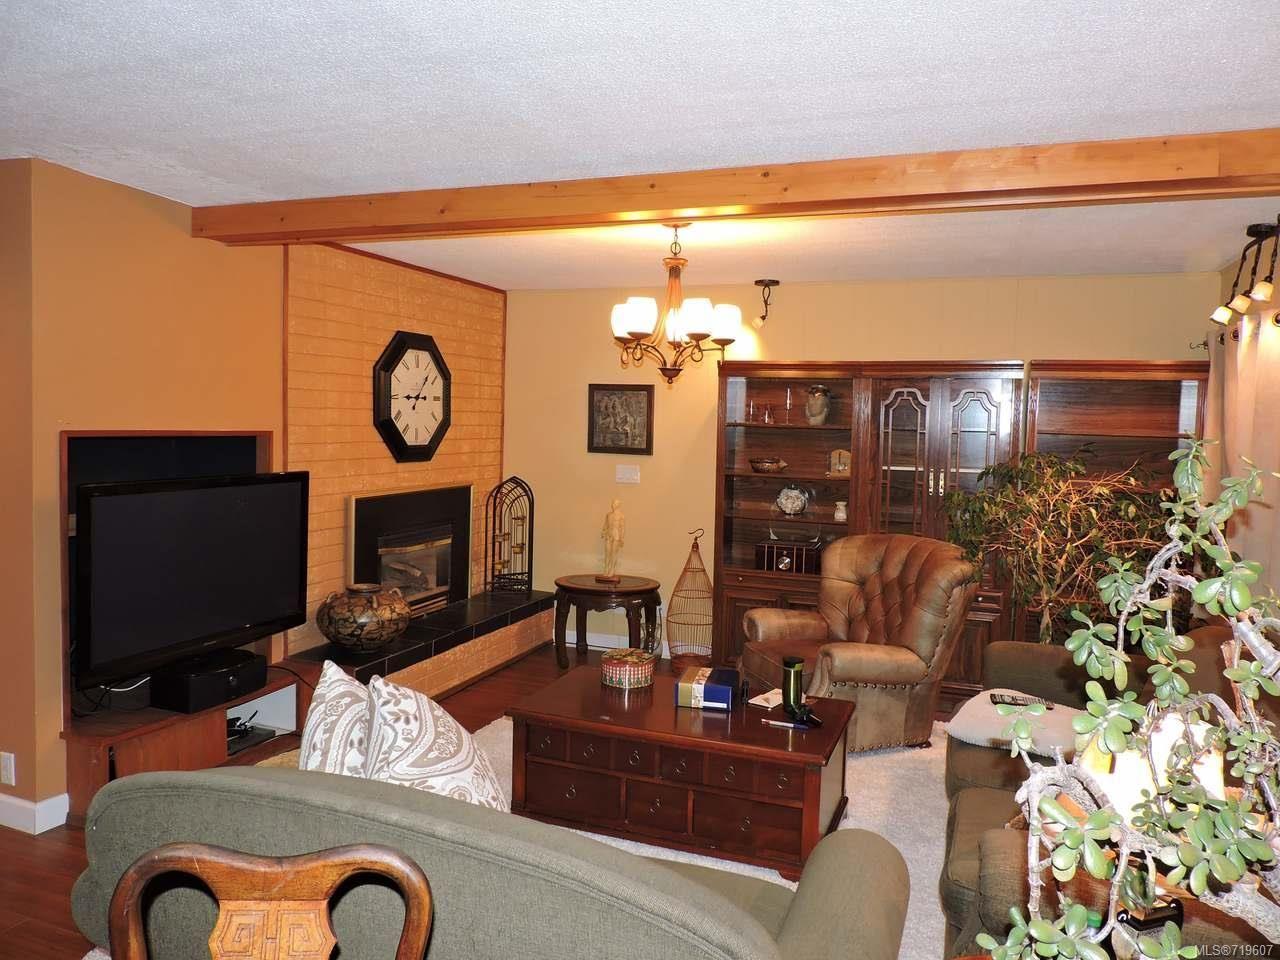 Photo 4: Photos: 935 Beach Dr in NANAIMO: Na Departure Bay House for sale (Nanaimo)  : MLS®# 719607